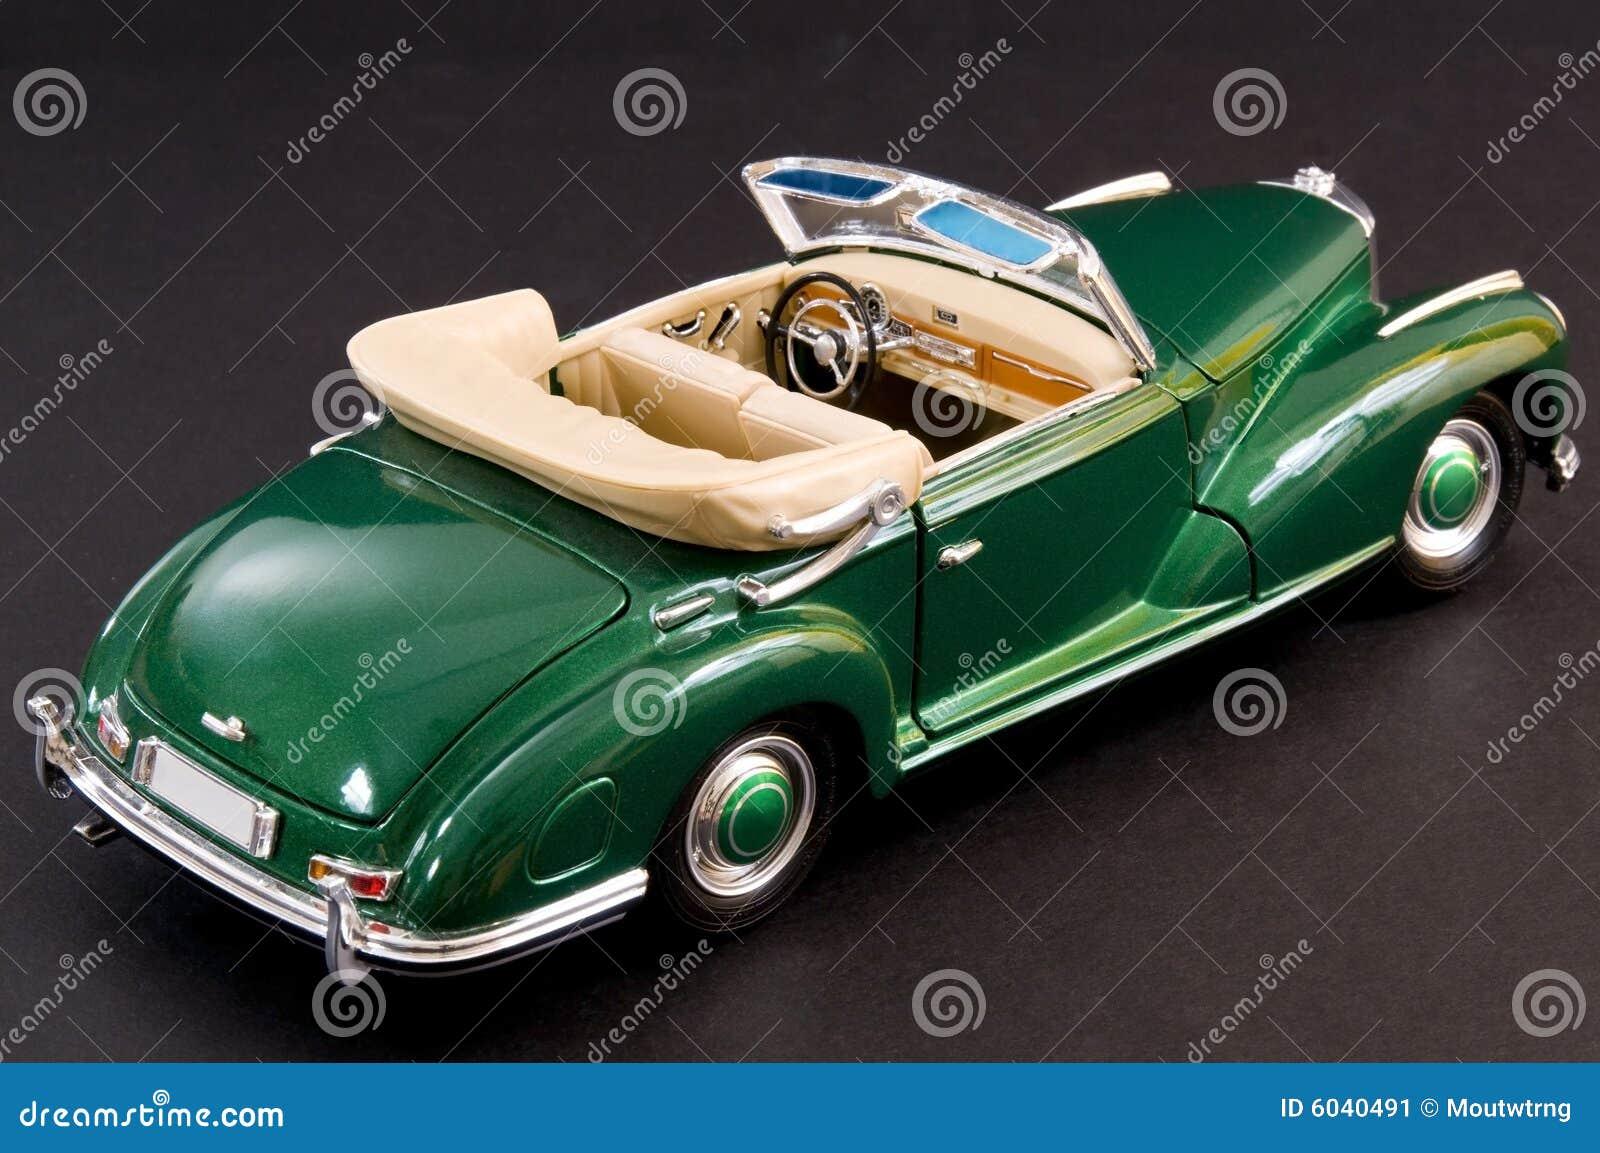 Green Sleek Classic Luxury Car